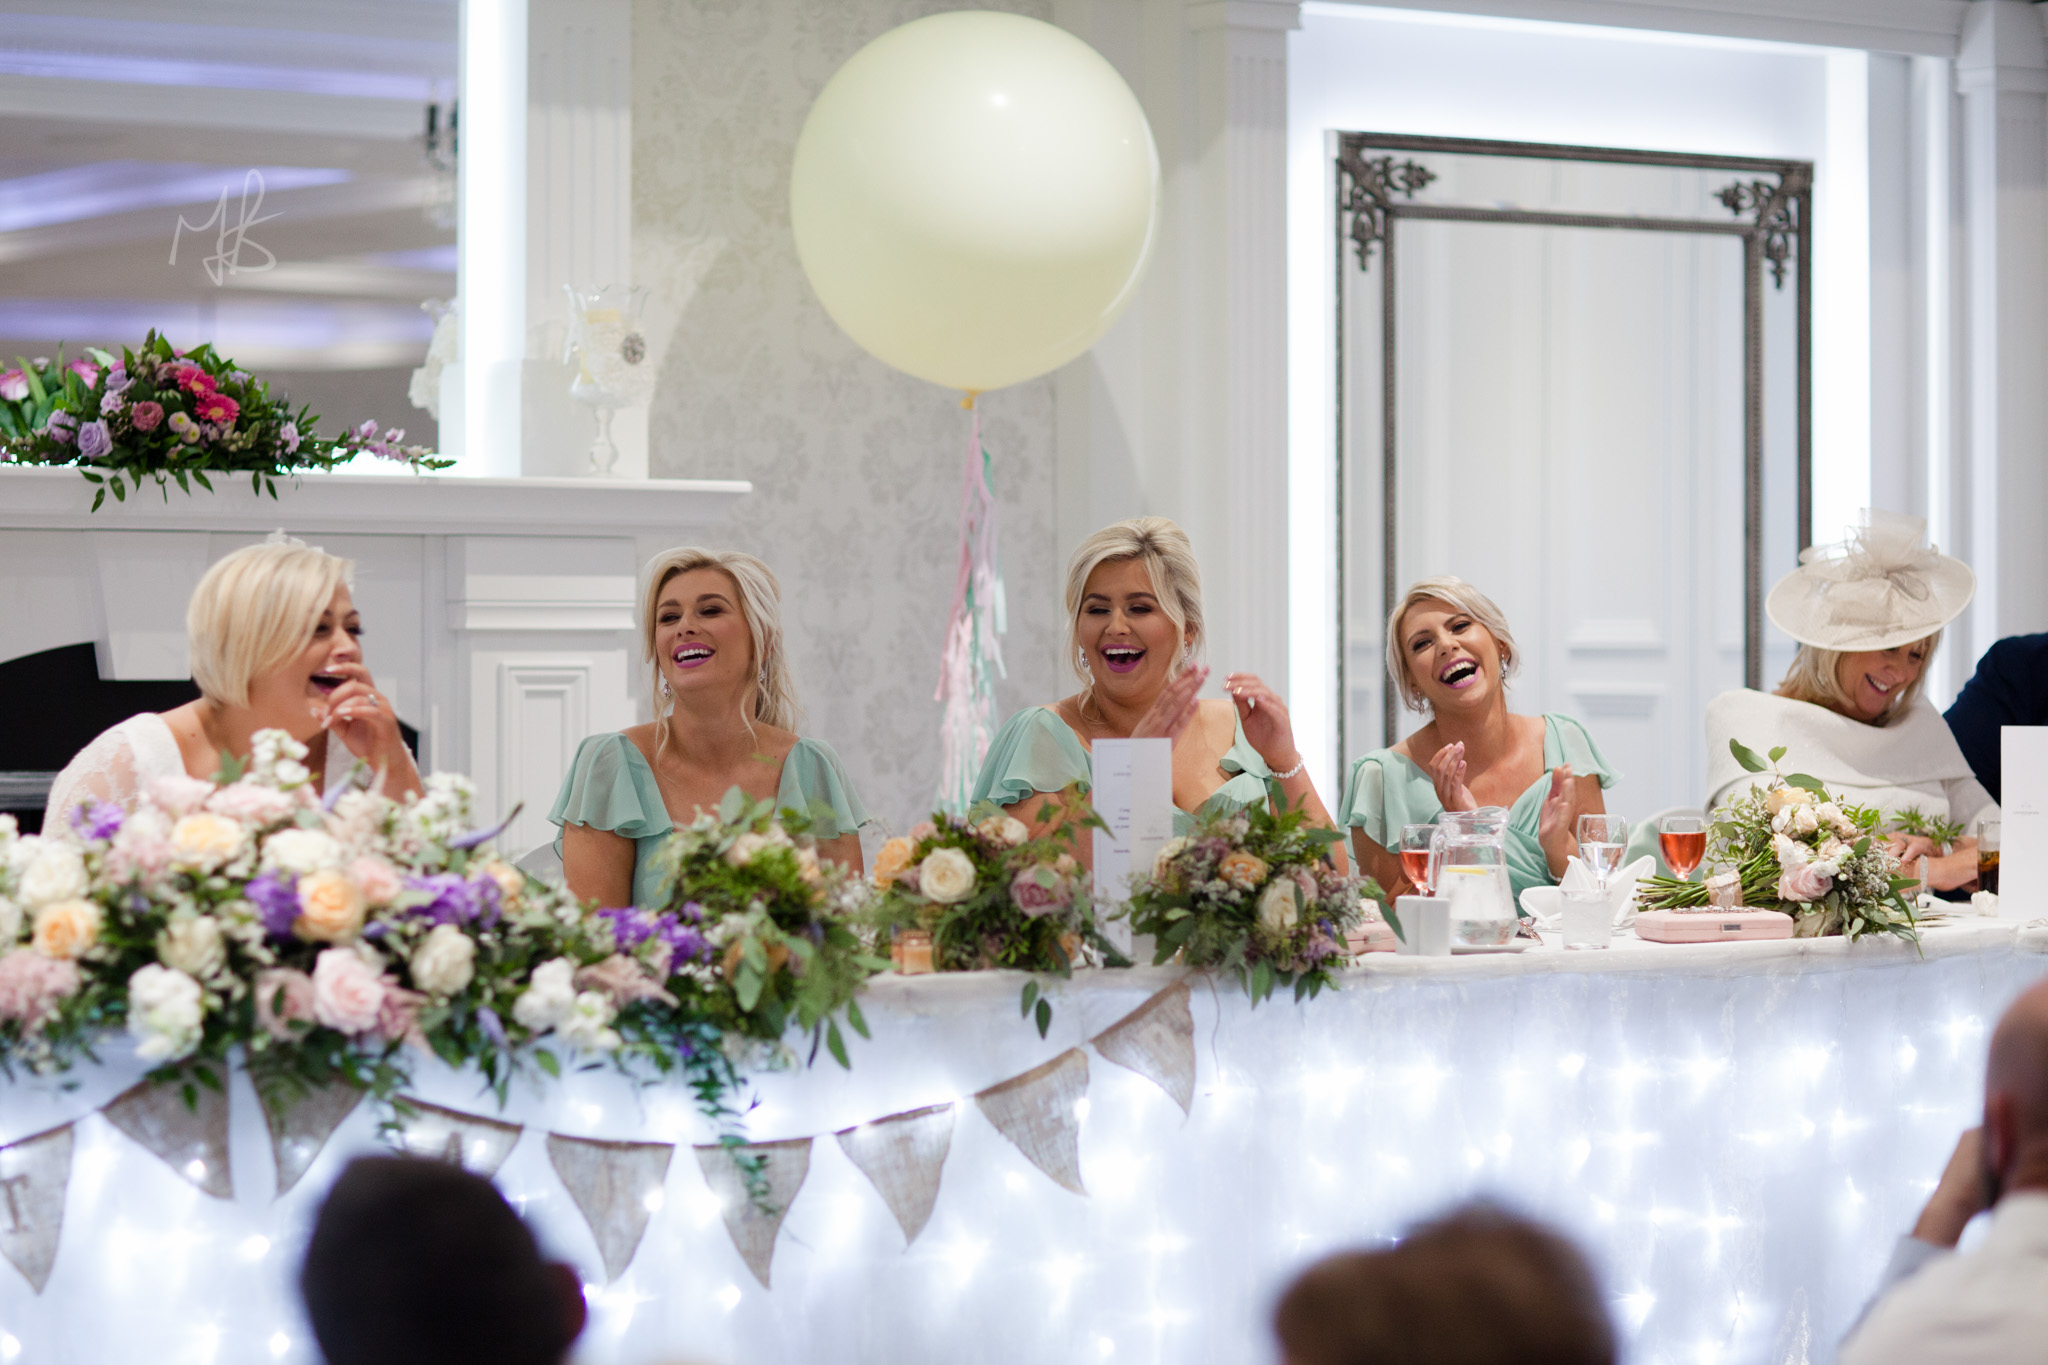 Northern-Ireland-Wedding-Photographer-Mark-Barnes-Ballymena_wedding-photography-Leighinmohr-House-Seamas_Alanna_For-web-42.jpg